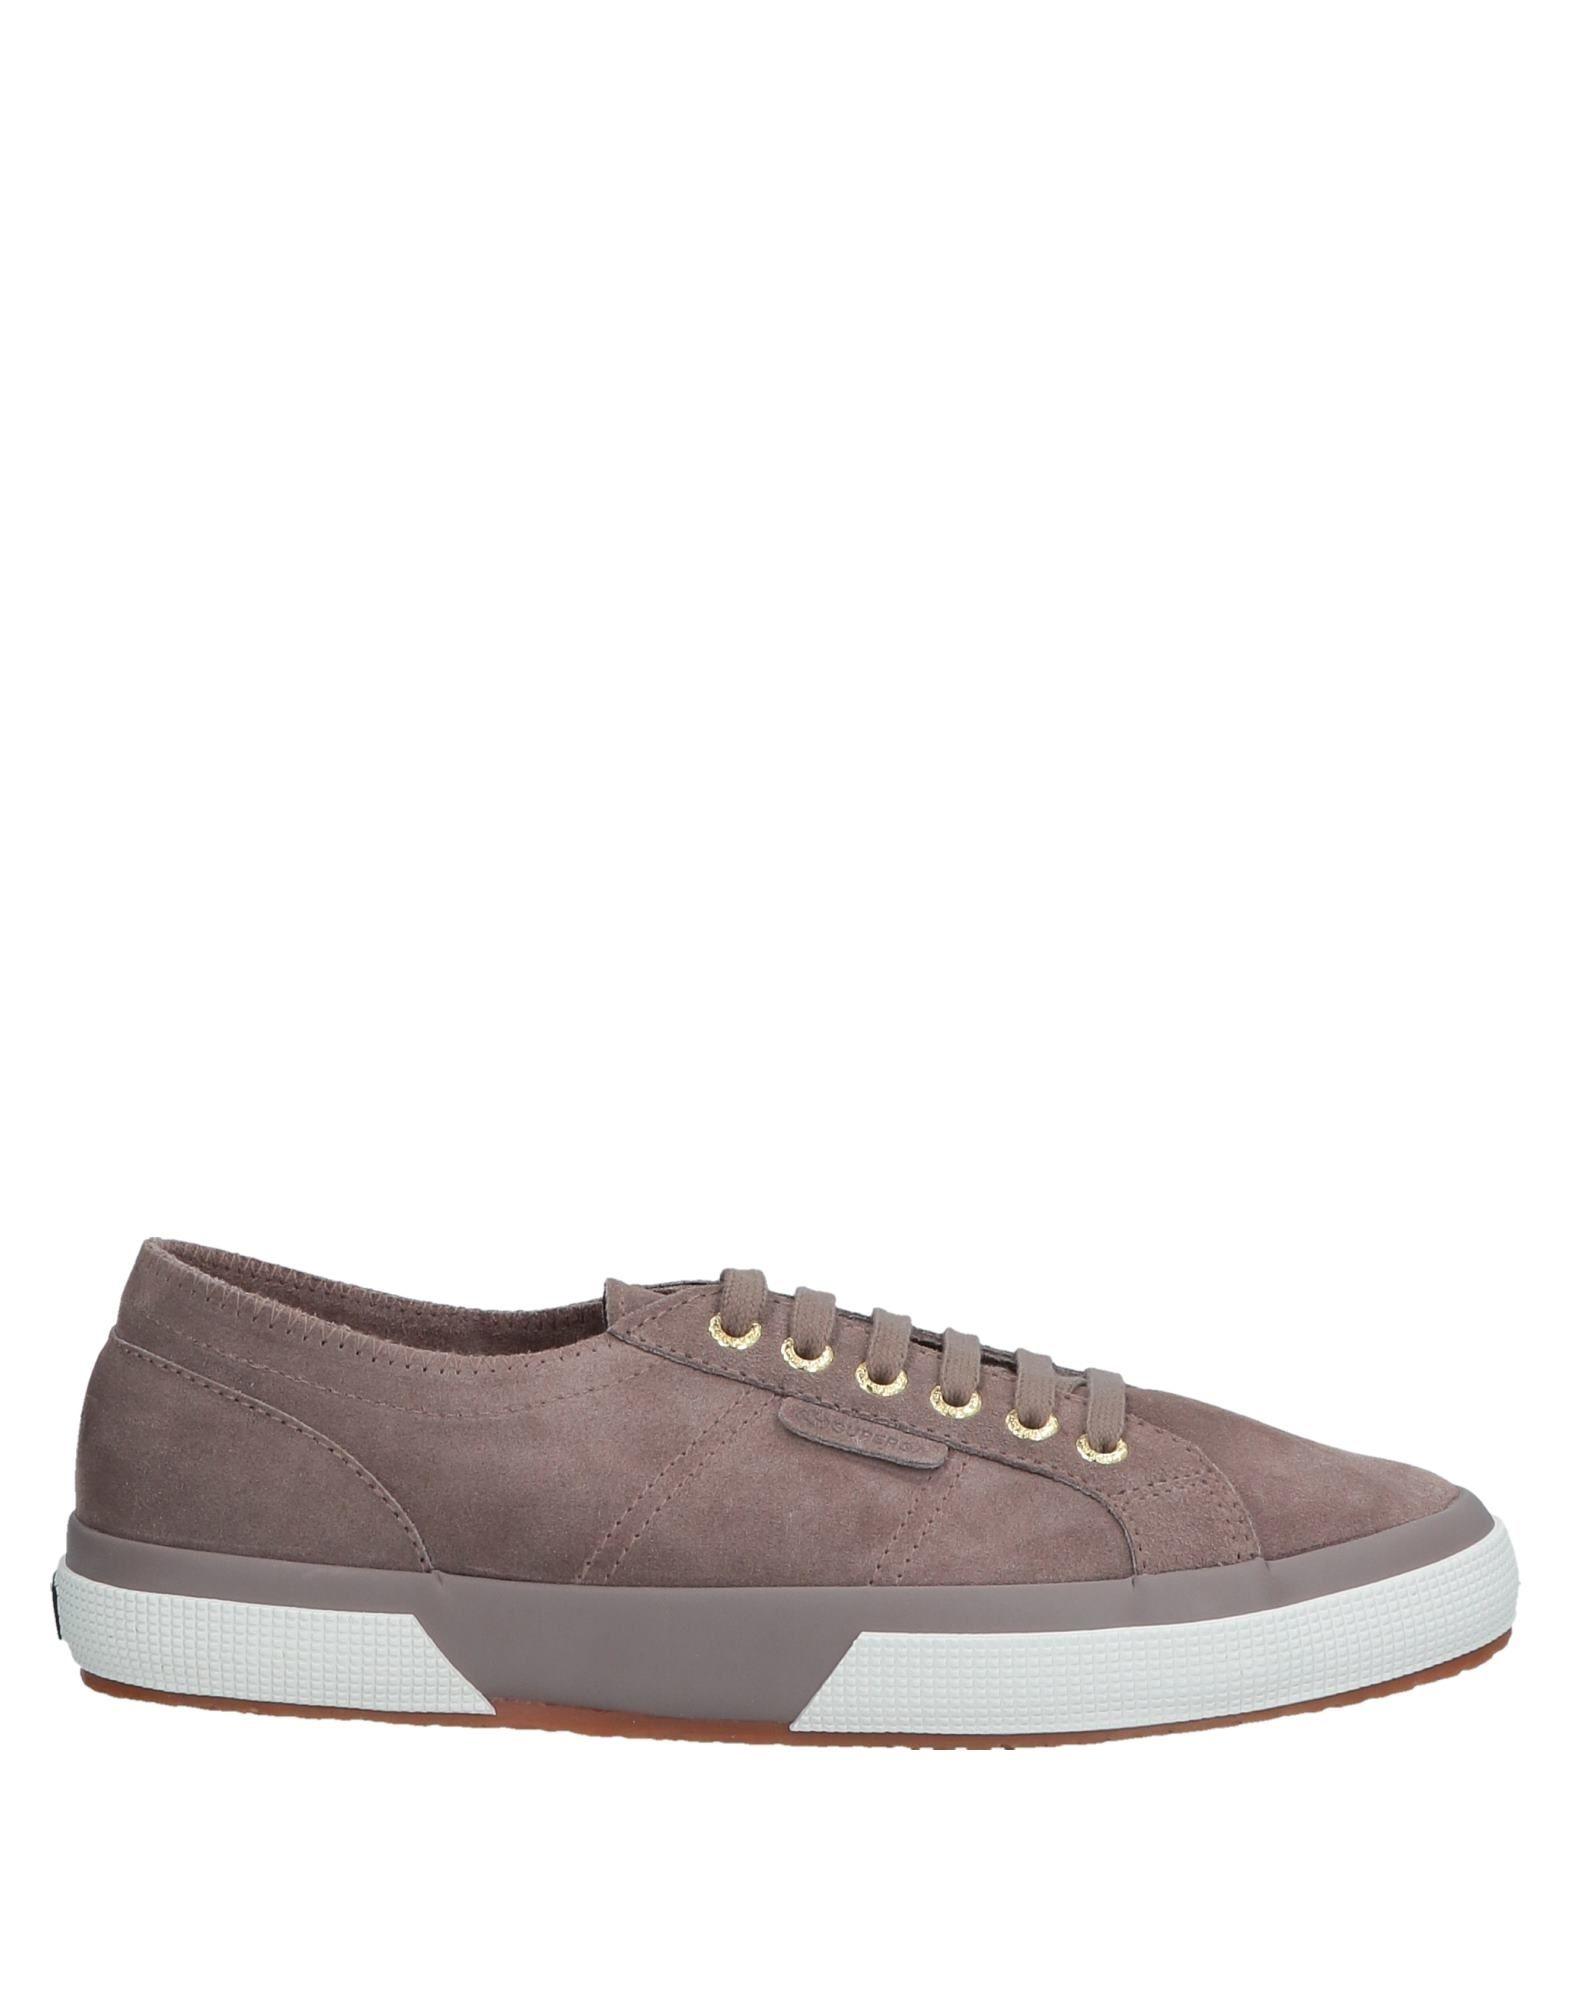 Rabatt echte Schuhe Superga® Sneakers Herren  11571093TP